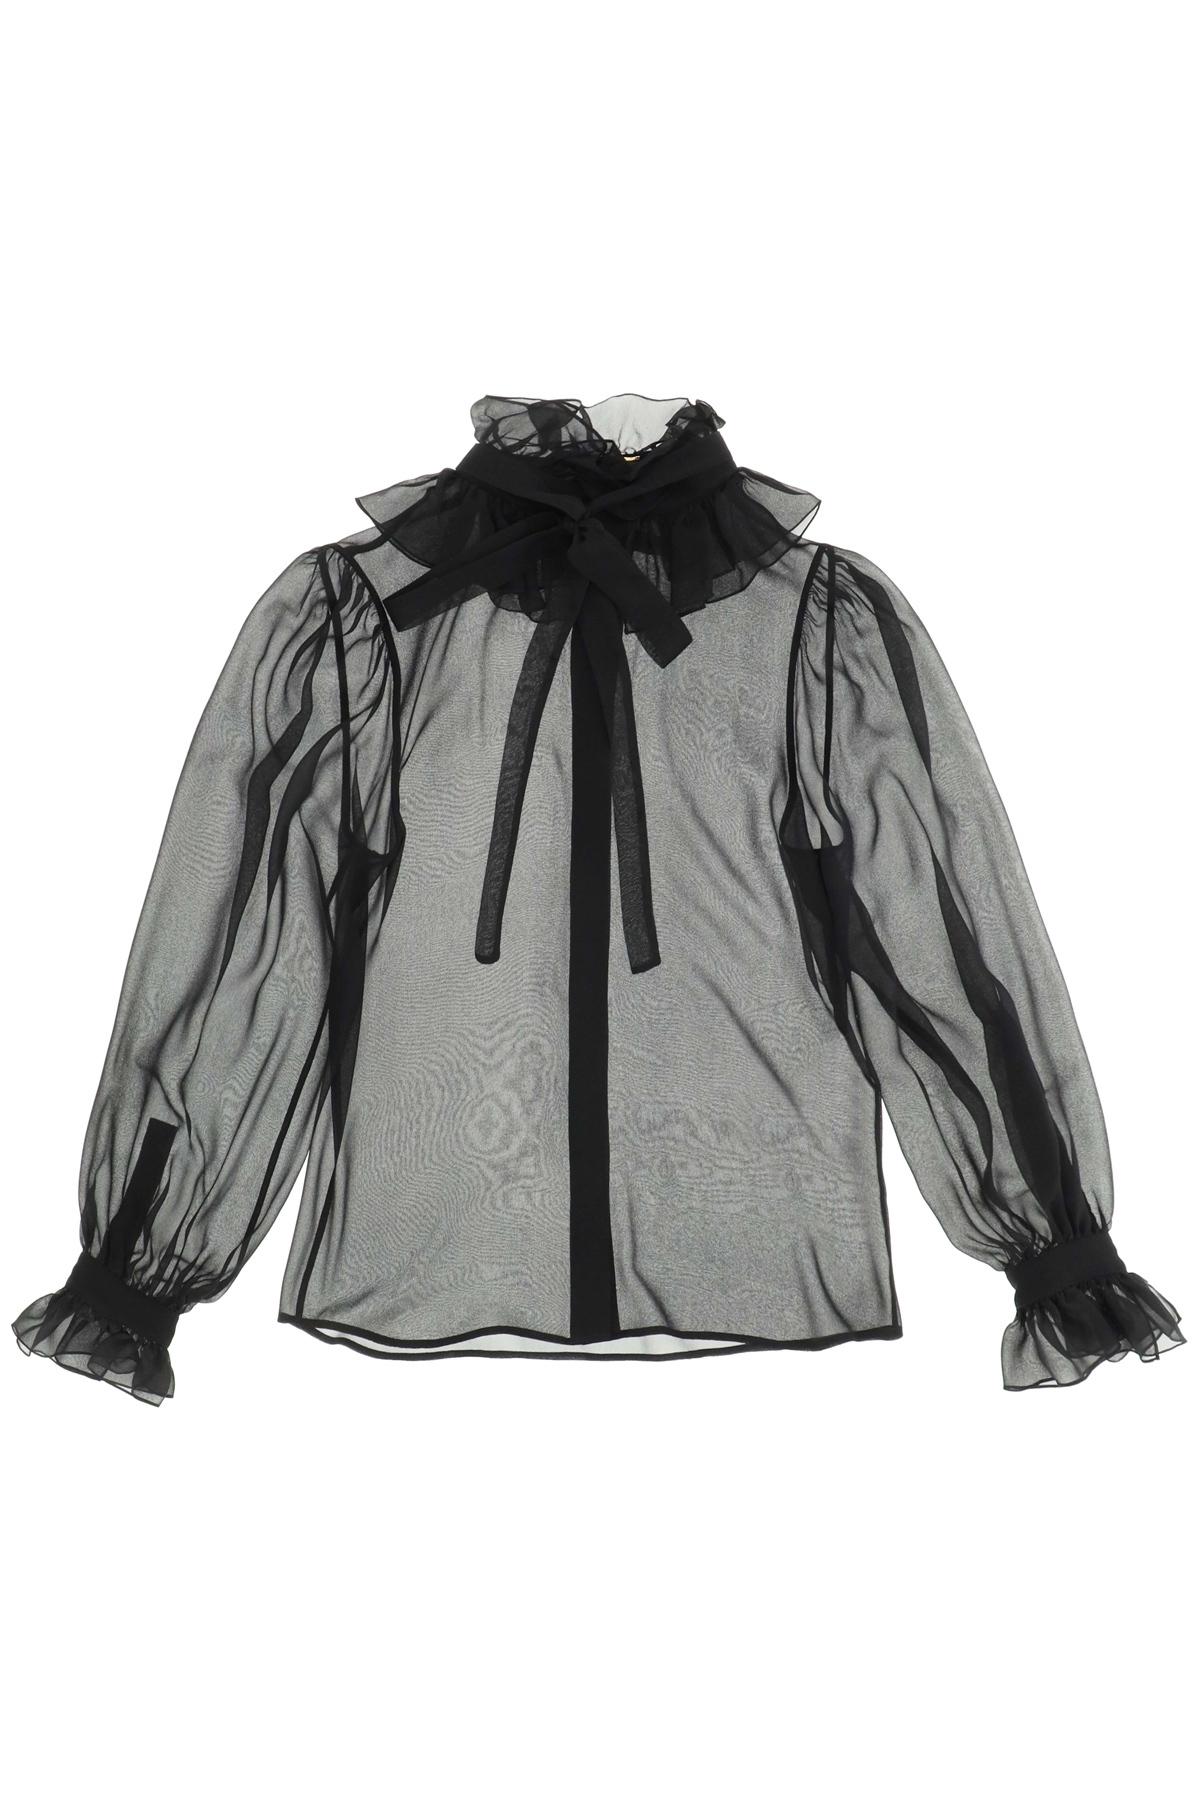 Saint laurent camicia mousseline di seta